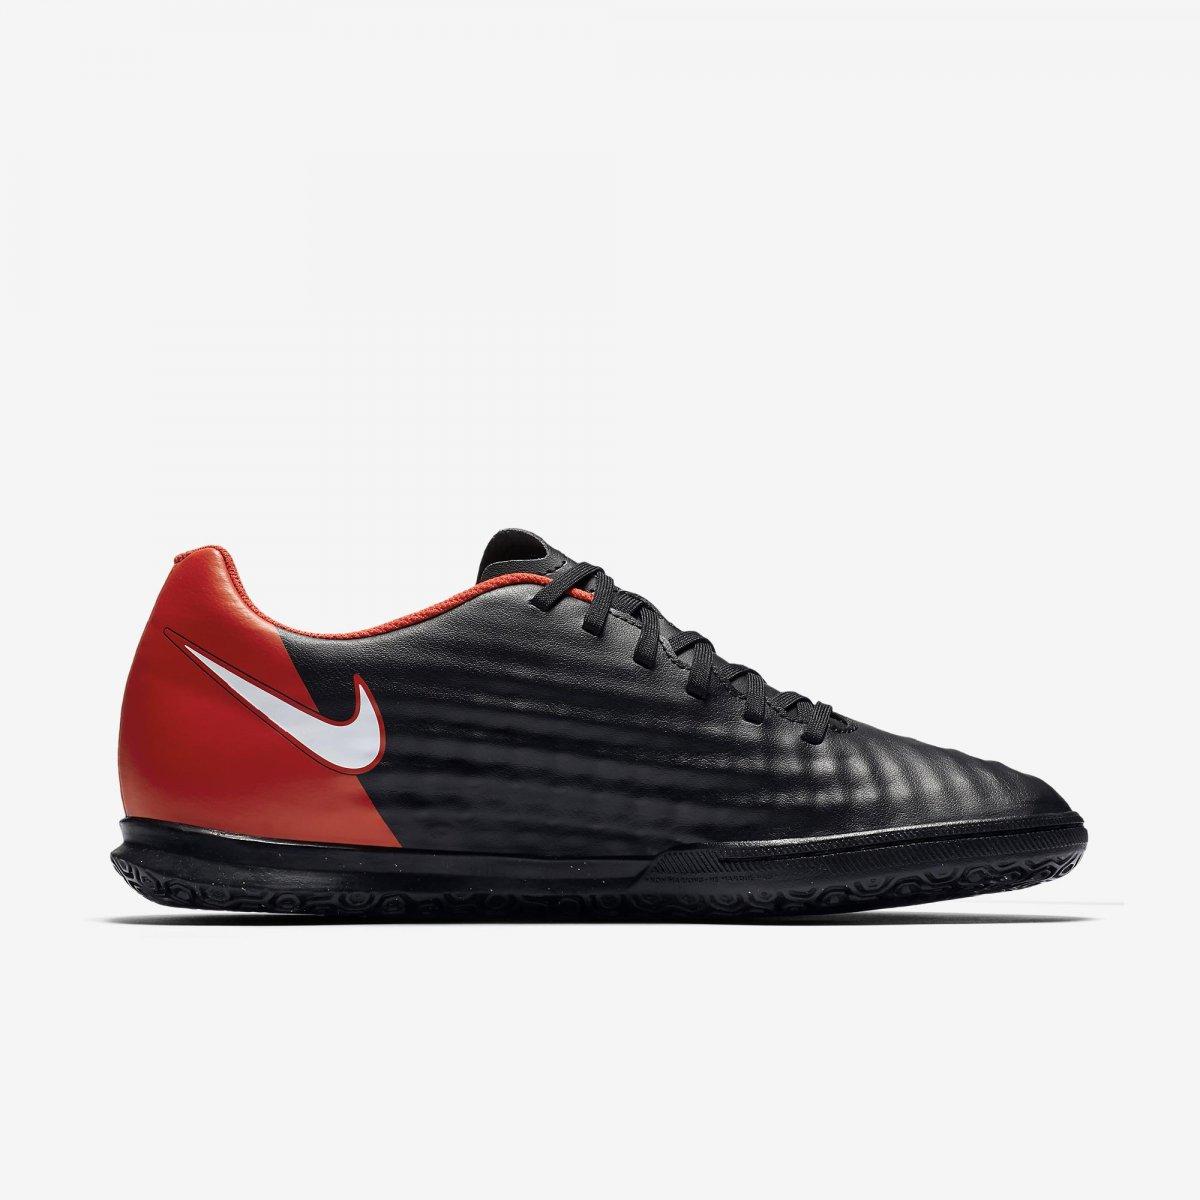 01f7e8a049 Bizz Store - Chuteira de Futsal Masculina Nike Magista Ola II IC